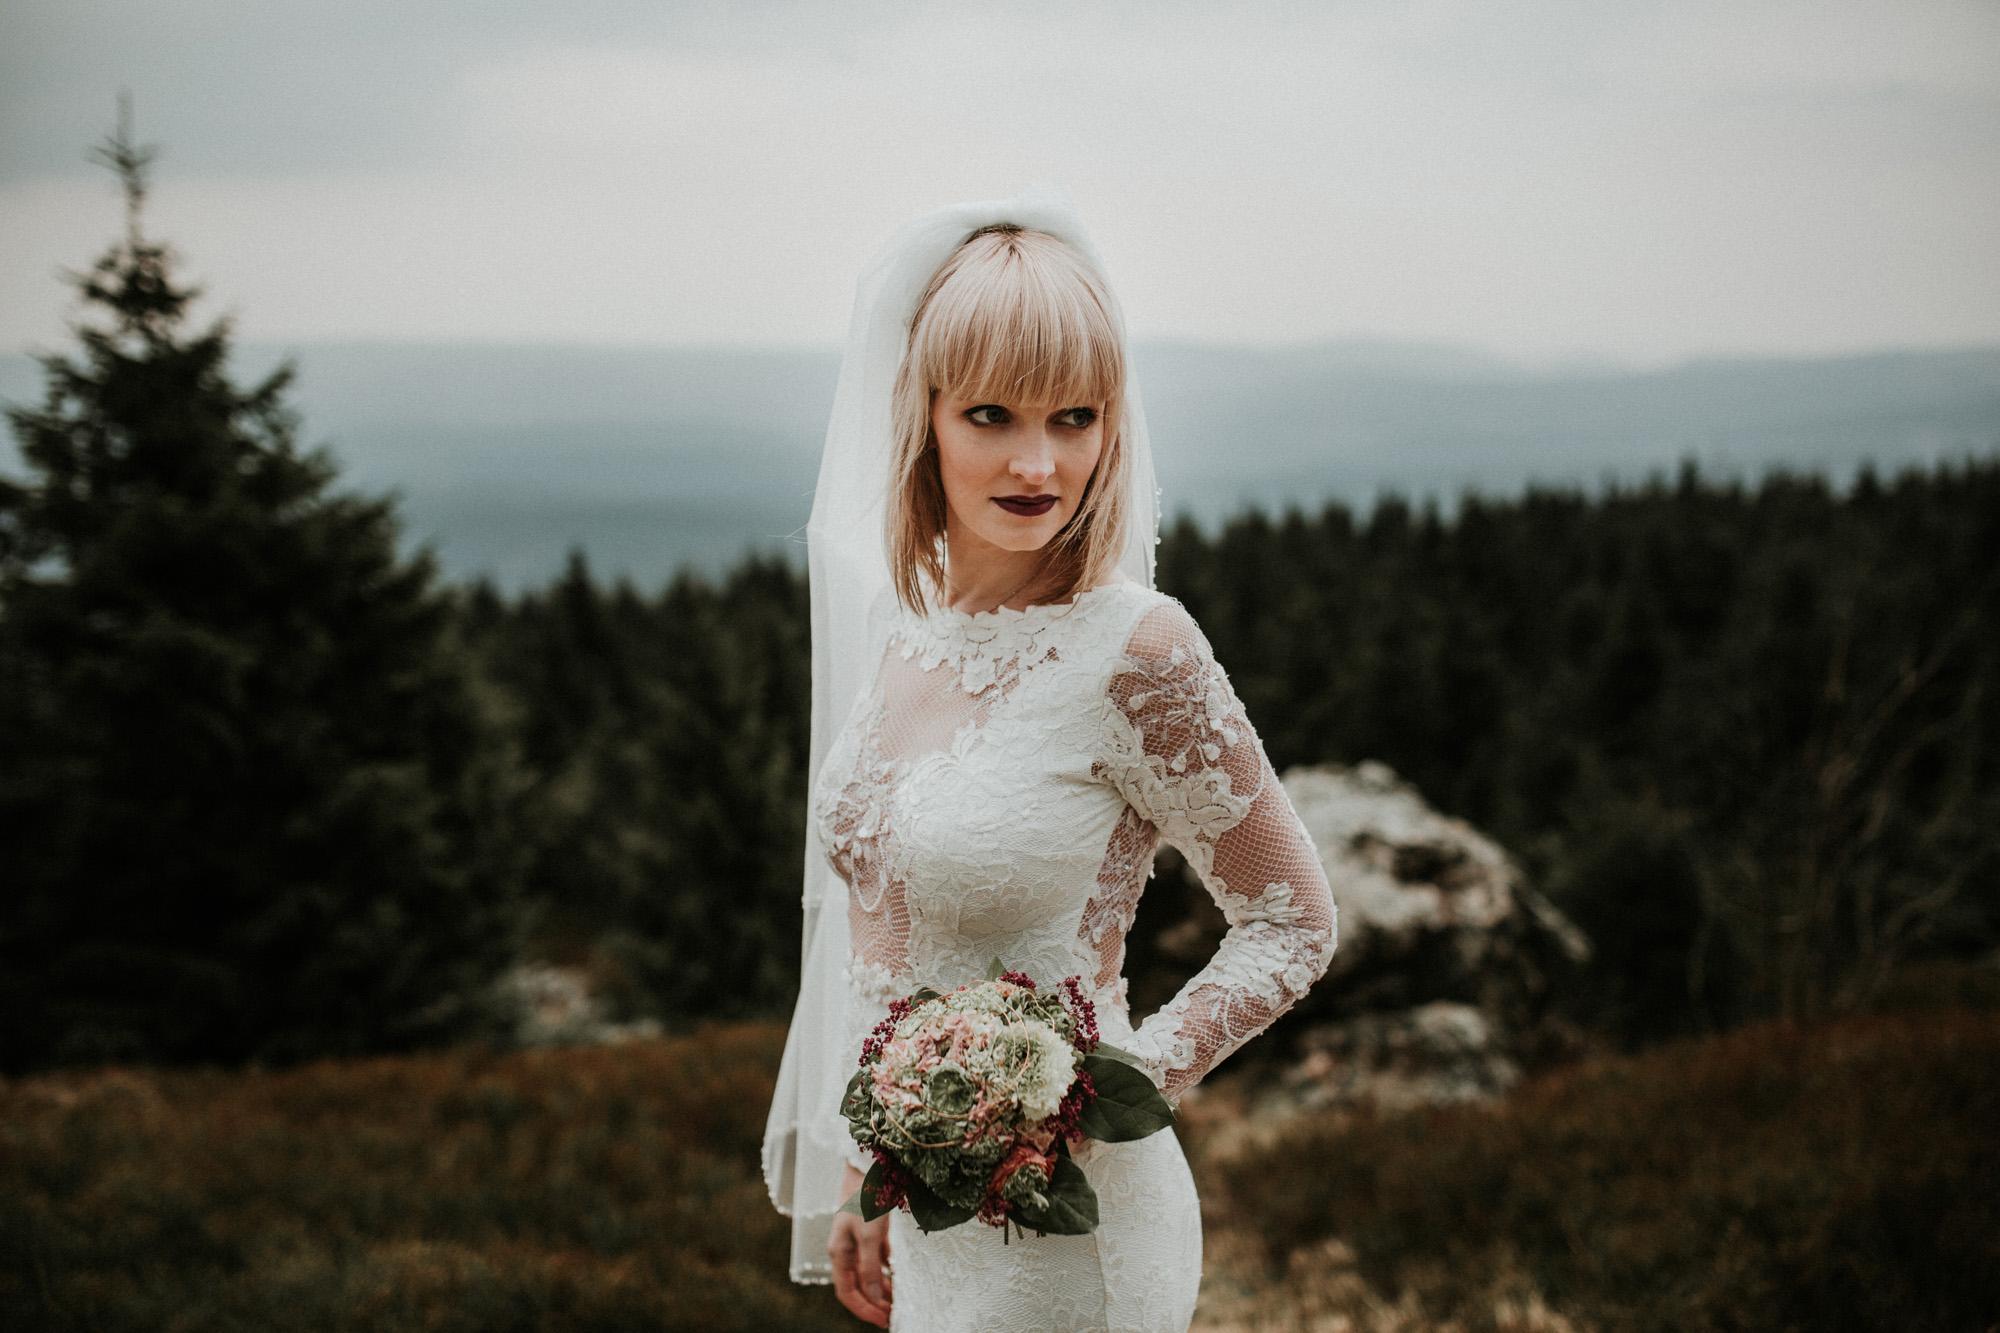 DanielaMarquardtPhotography_Hochzeitsfotograf_Düsseldorf_Köln_Mallorca_Bayern_Austria_Harz_LinaundMaik_Afterwedding-Shooting_Weddingphotographer_Ibiza_Tuskany_Italien_Toskana108